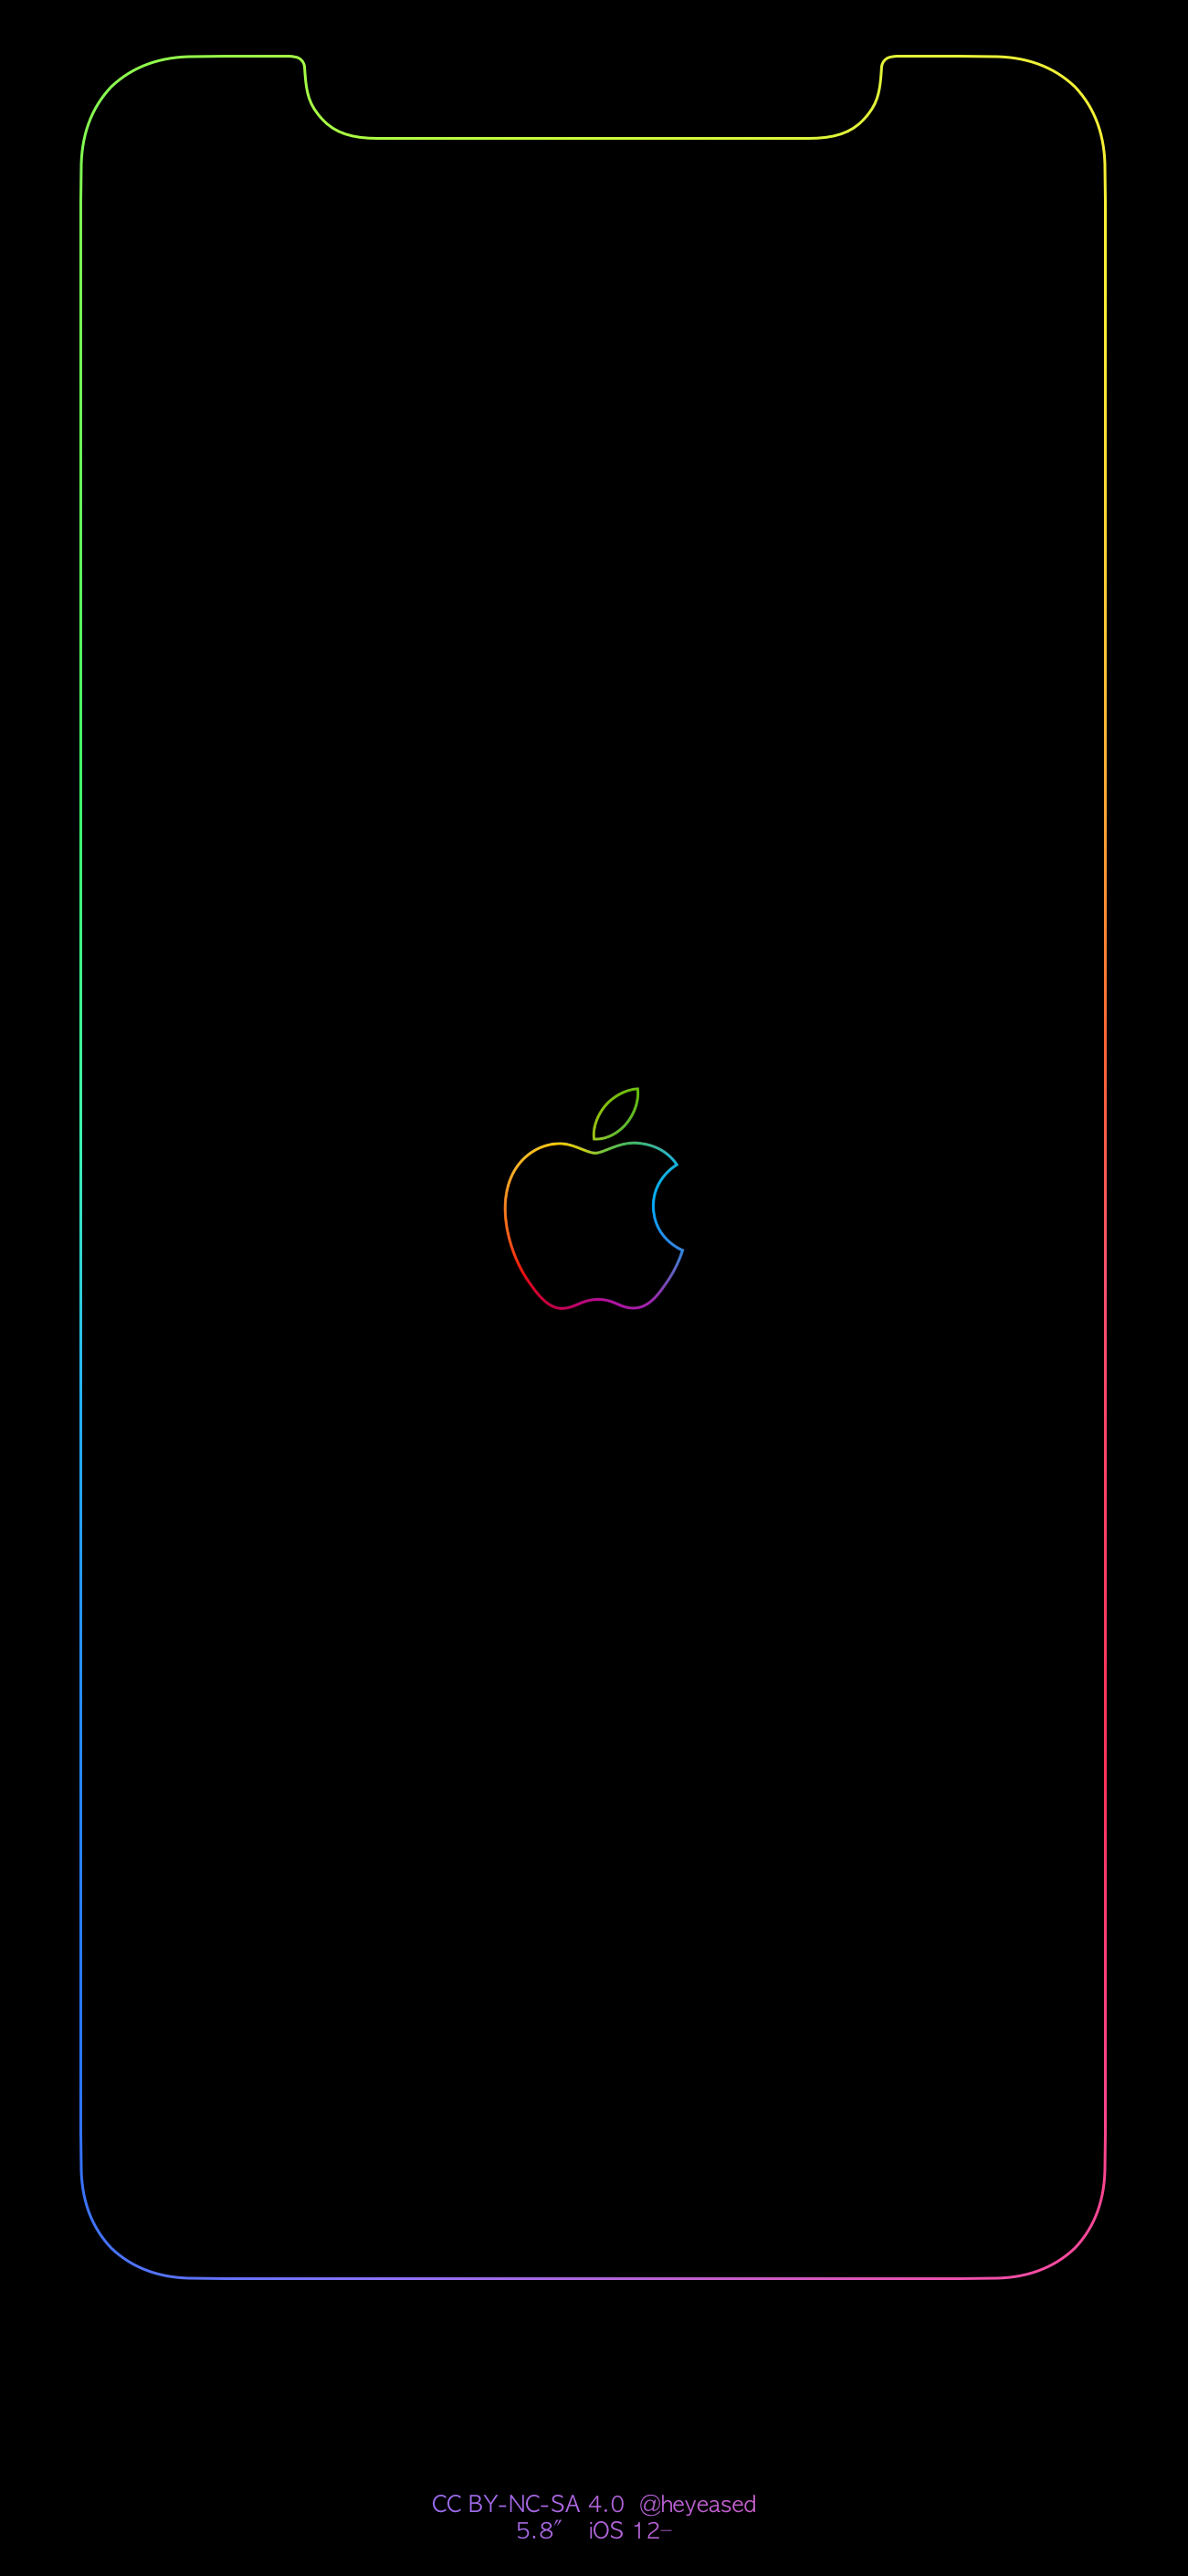 Download: iPhone 8 September 12 Event Wallpapers | Apple logo wallpaper  iphone, Apple logo wallpaper, Apple wallpaper iphone | 2820x1301